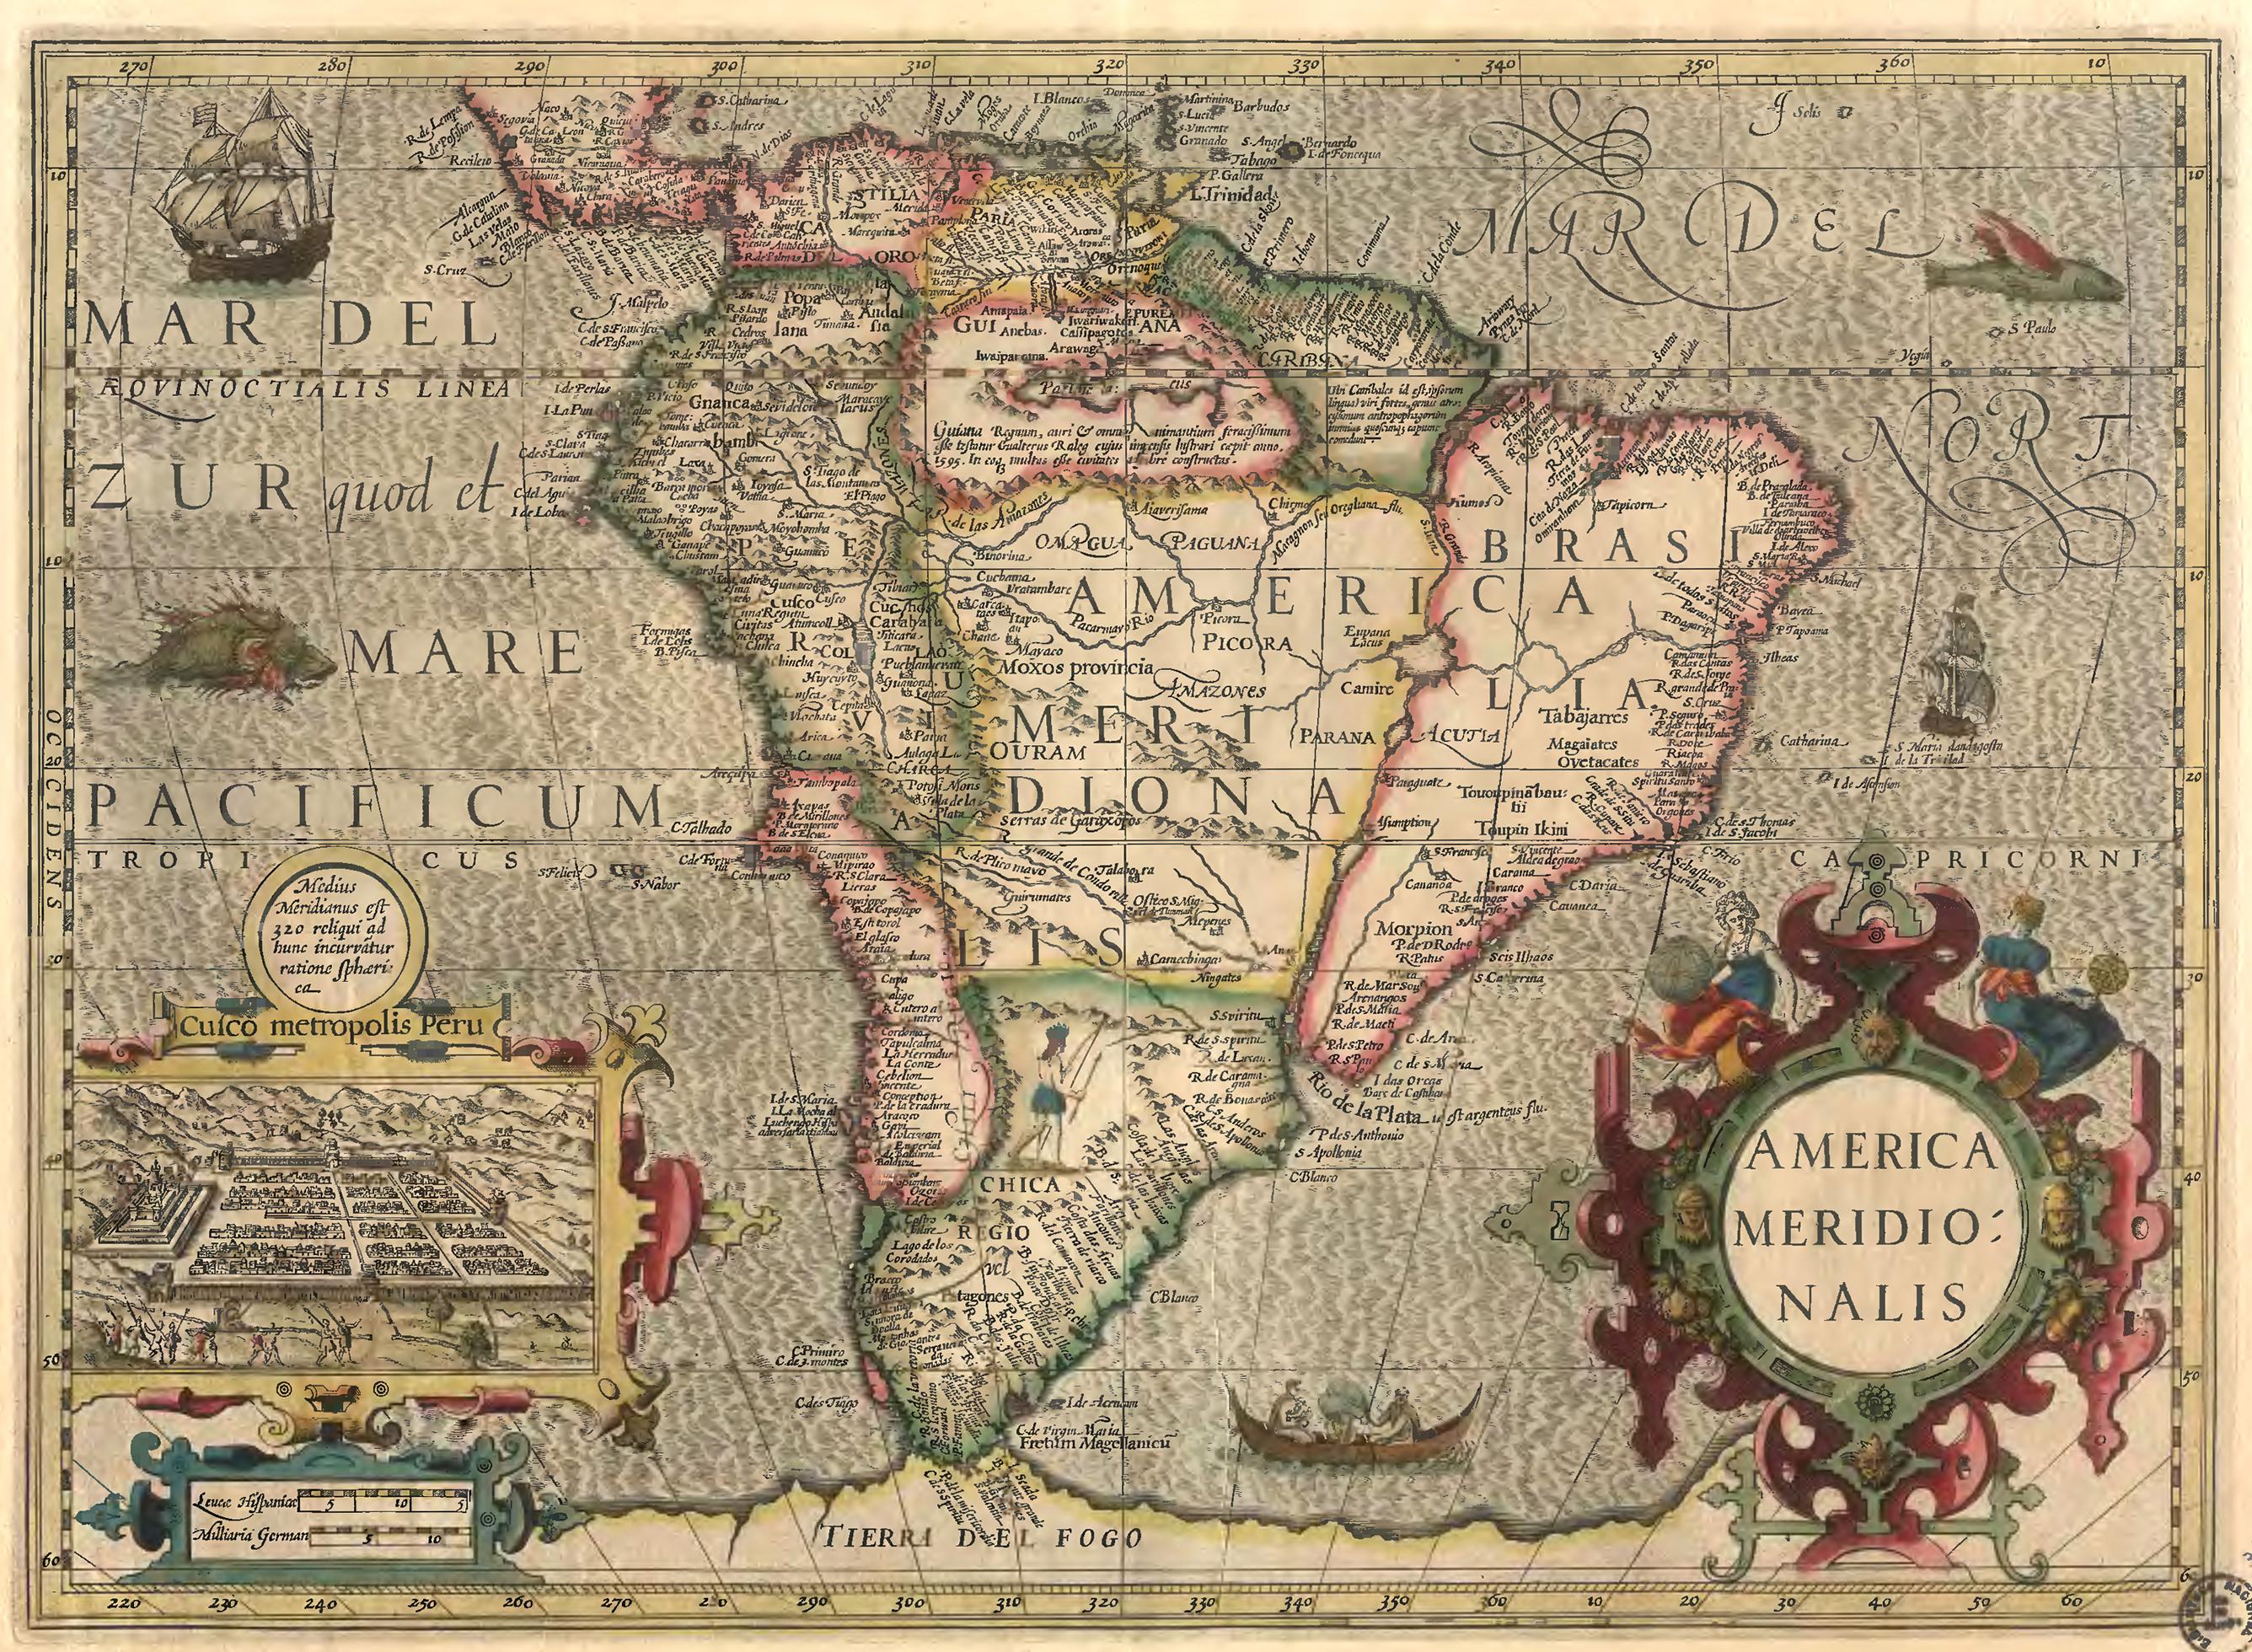 File:1606 America Merid. Mercator mr.jpg